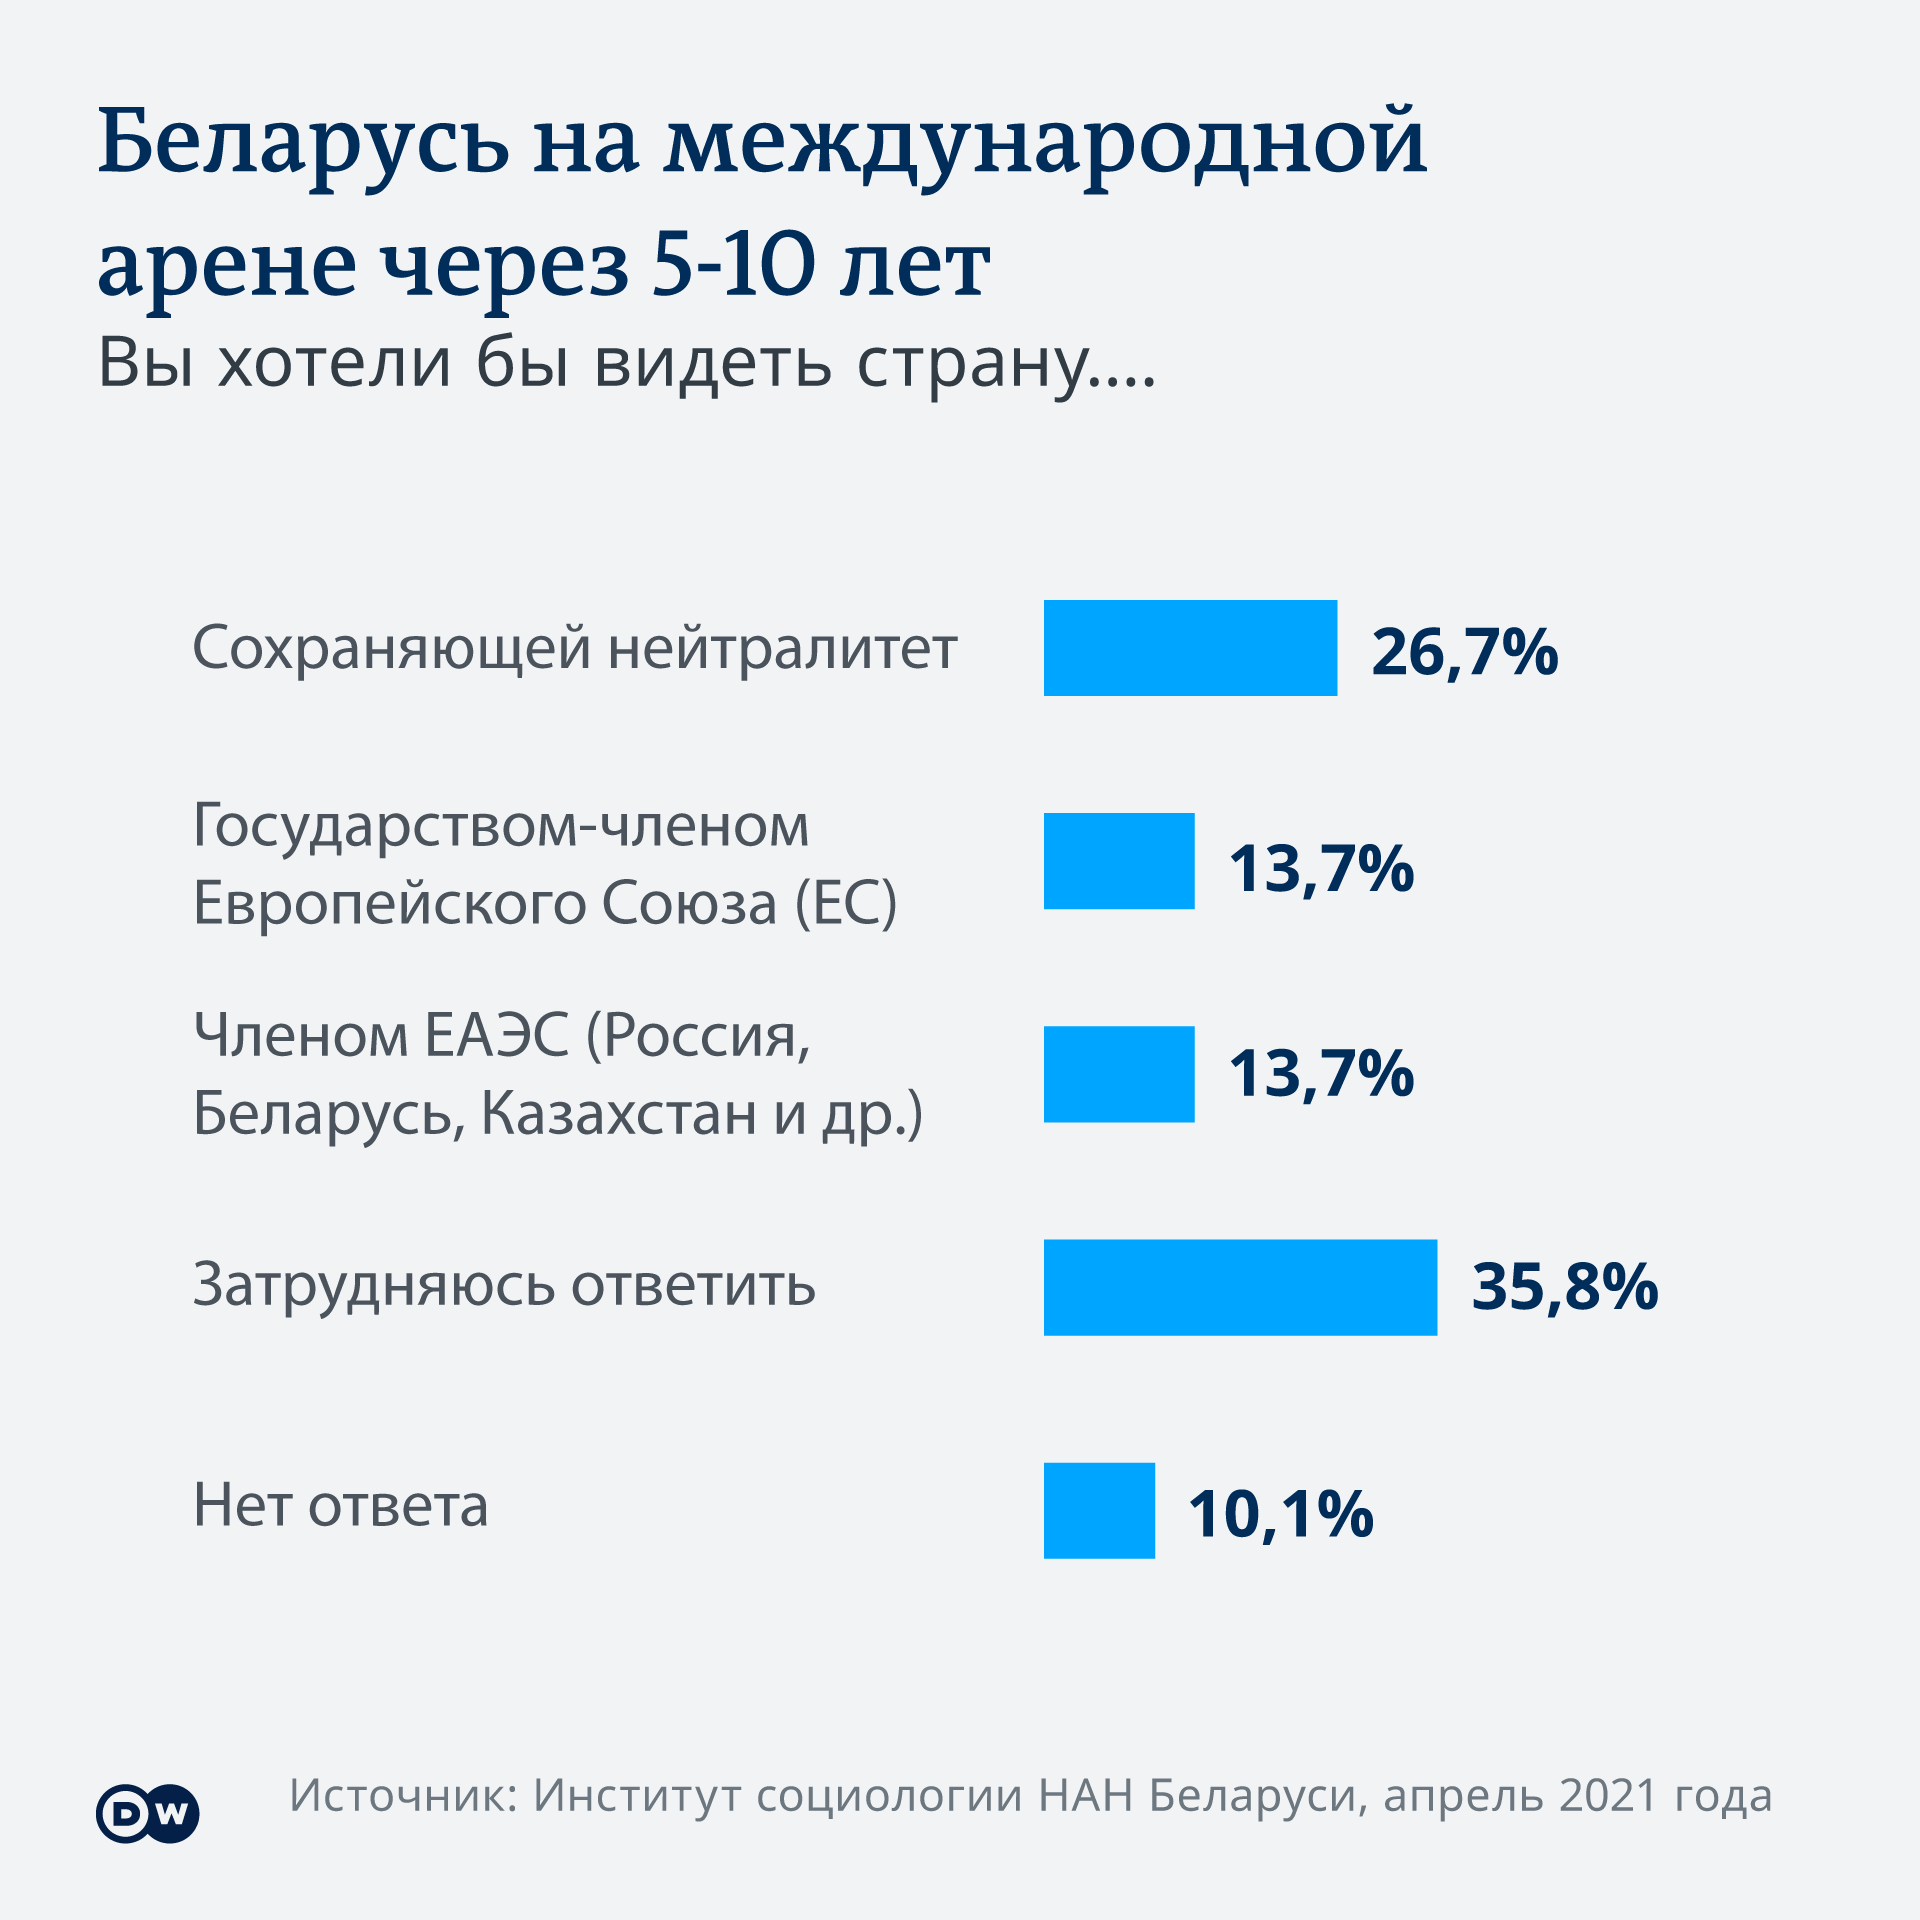 Инфографика Соцопрос о нейтралитете Беларуси